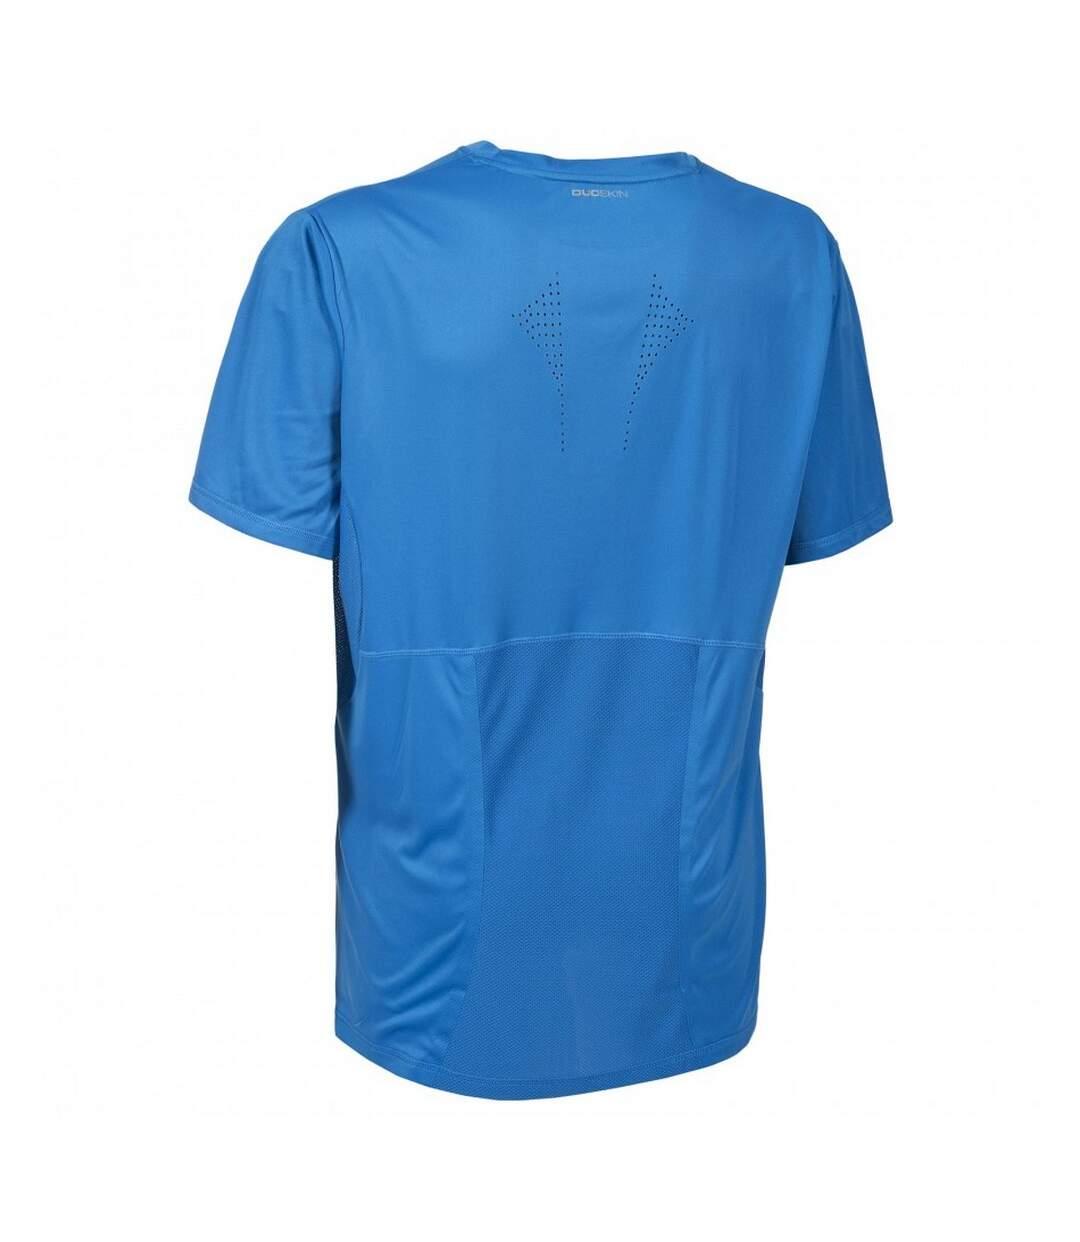 Trespass Mens Uri Short Sleeve Sports T-Shirt (Bright Blue) - UTTP3395